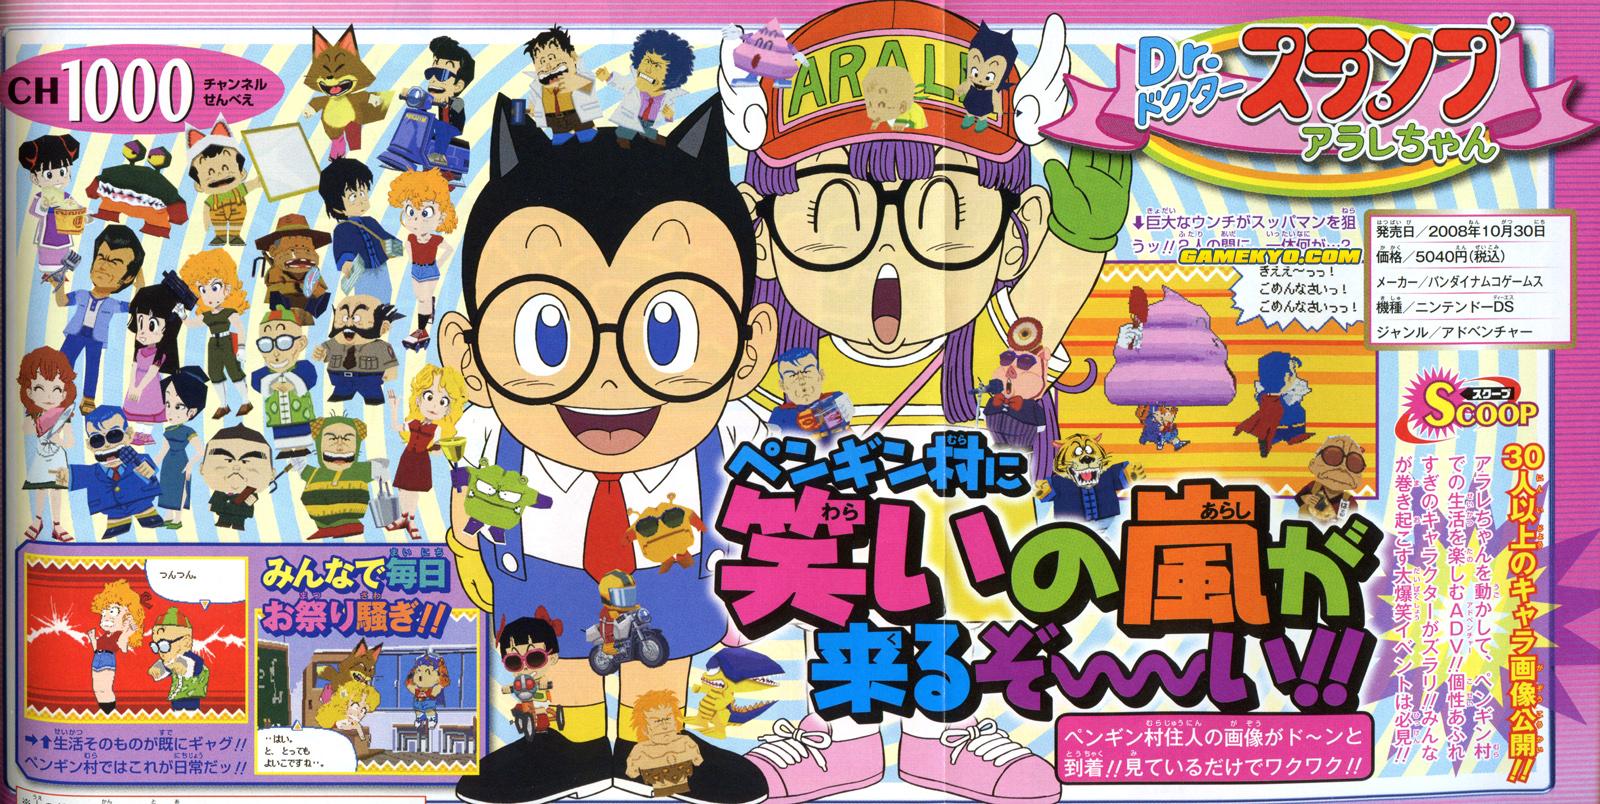 Dr. Slump: Arale-chan   Dr Slump Wiki   Fandom